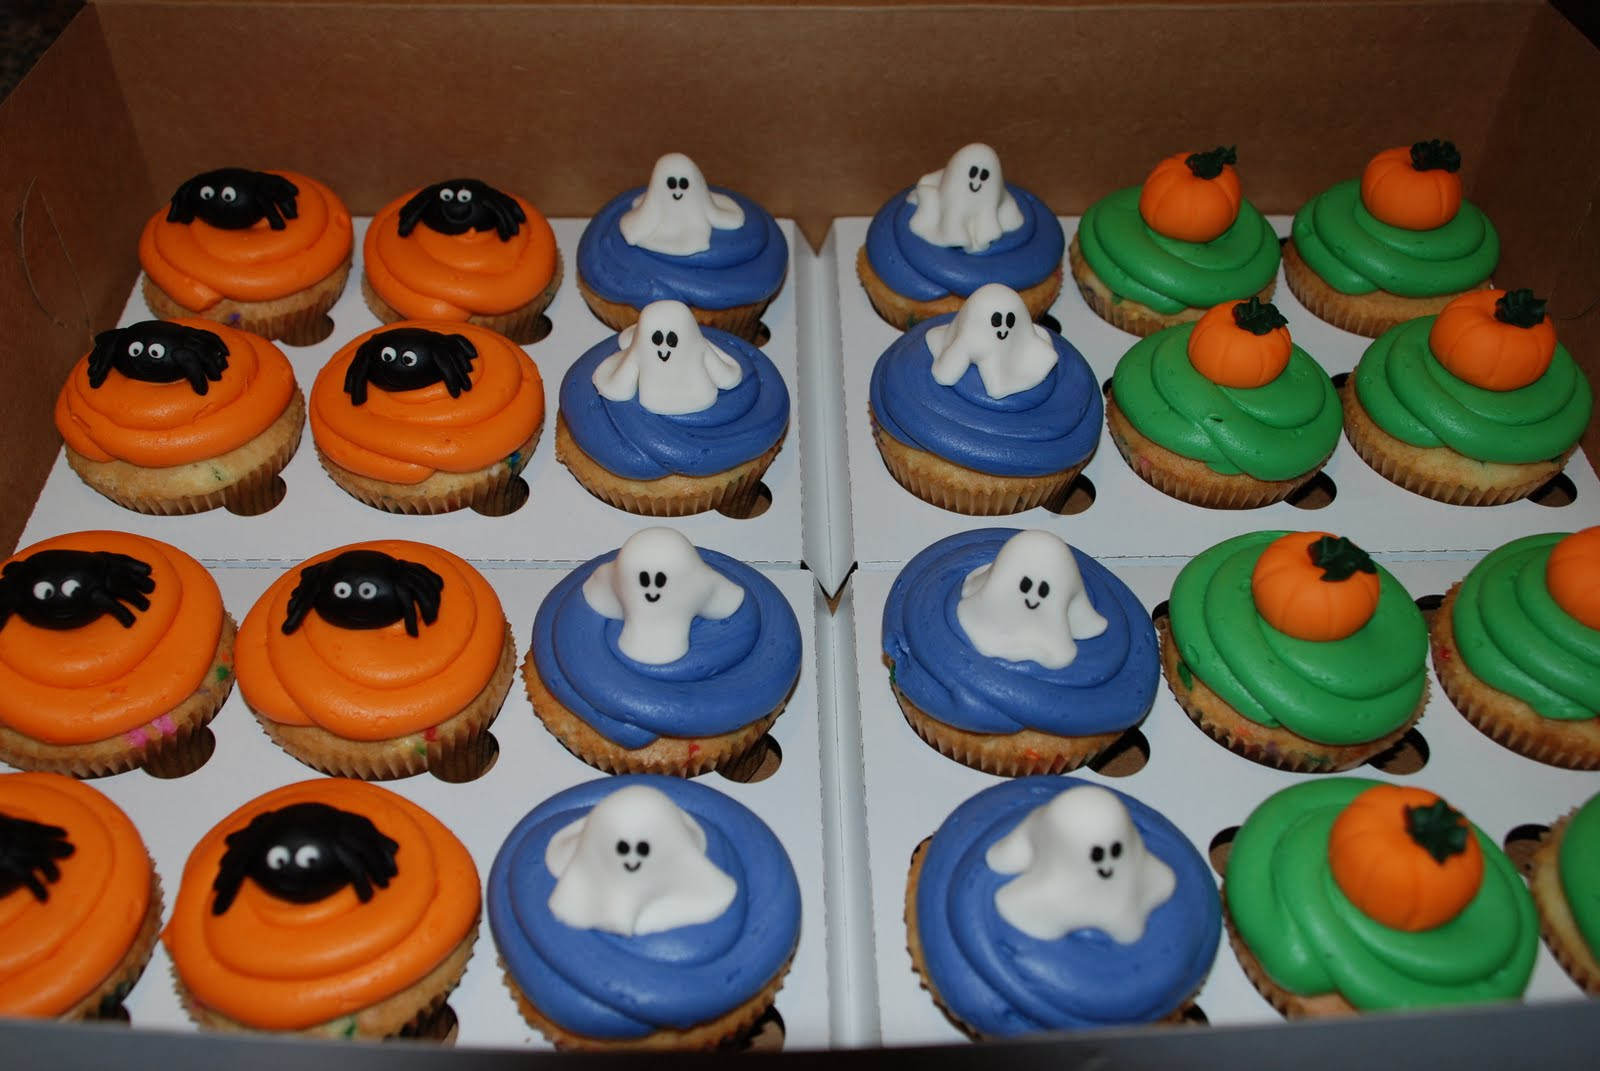 Halloween Cakes And Cupcakes  Halloween Cakes – Decoration Ideas